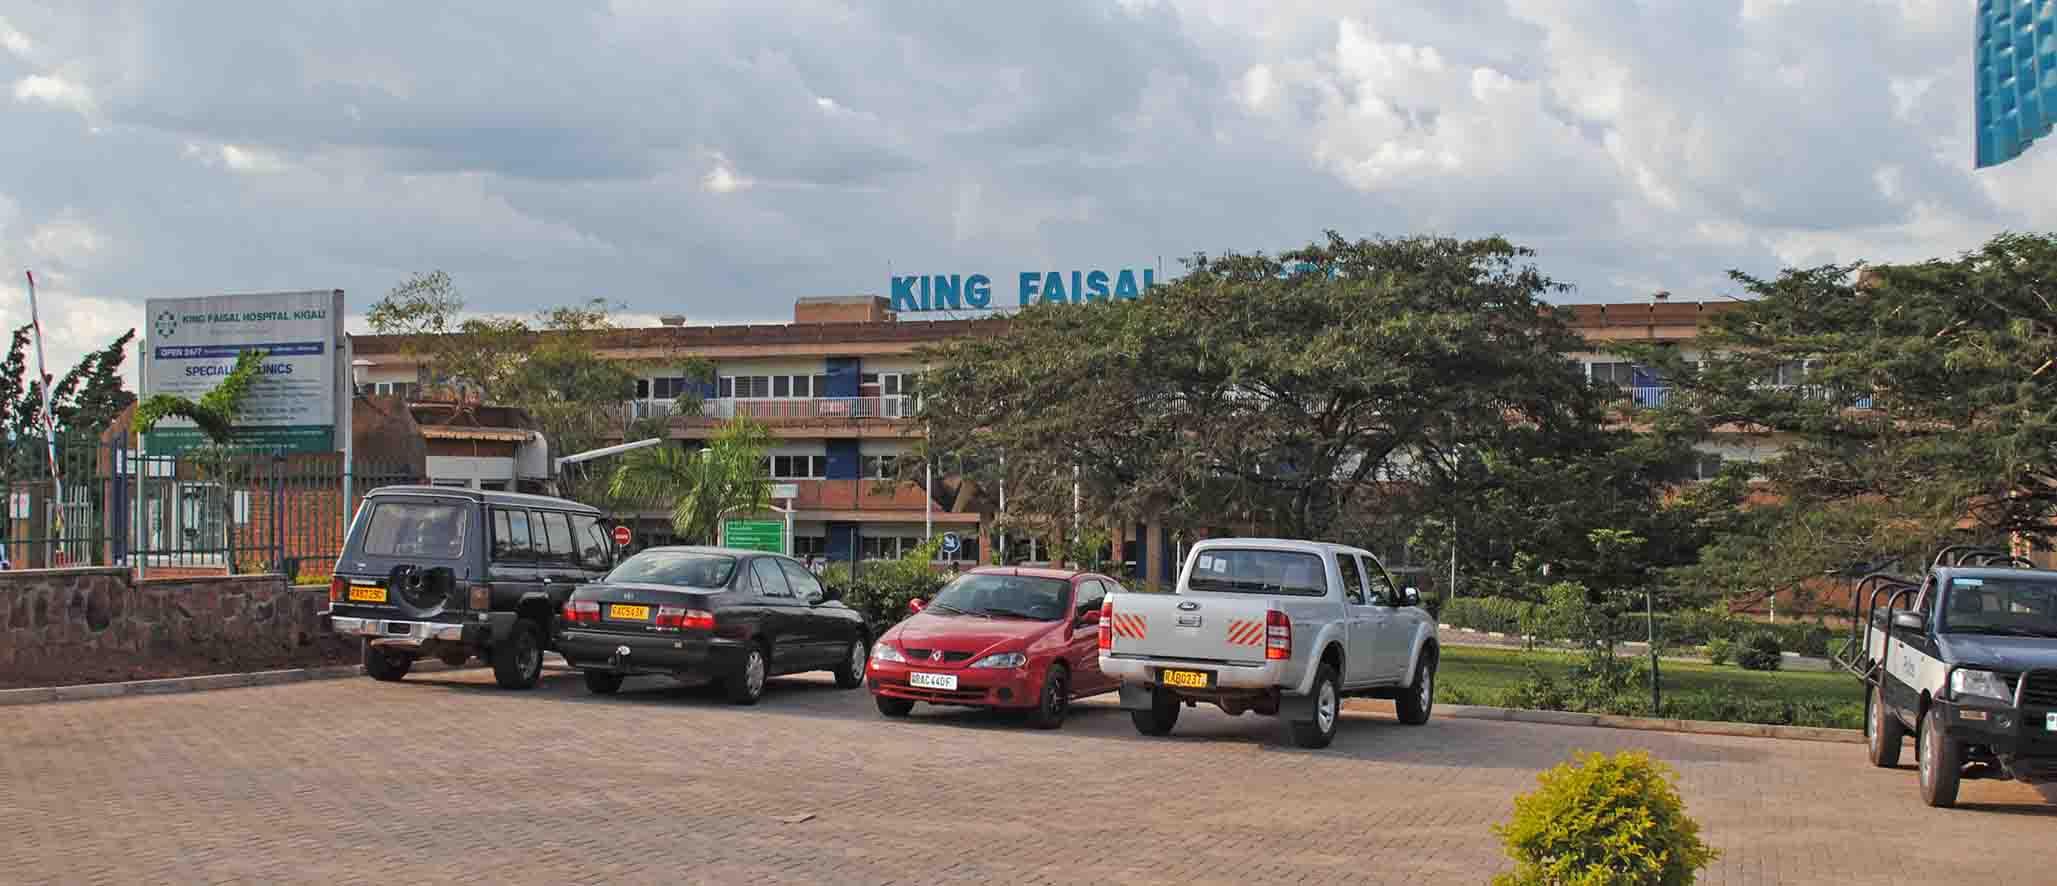 King Faisal Hospital in Kigali.JPG